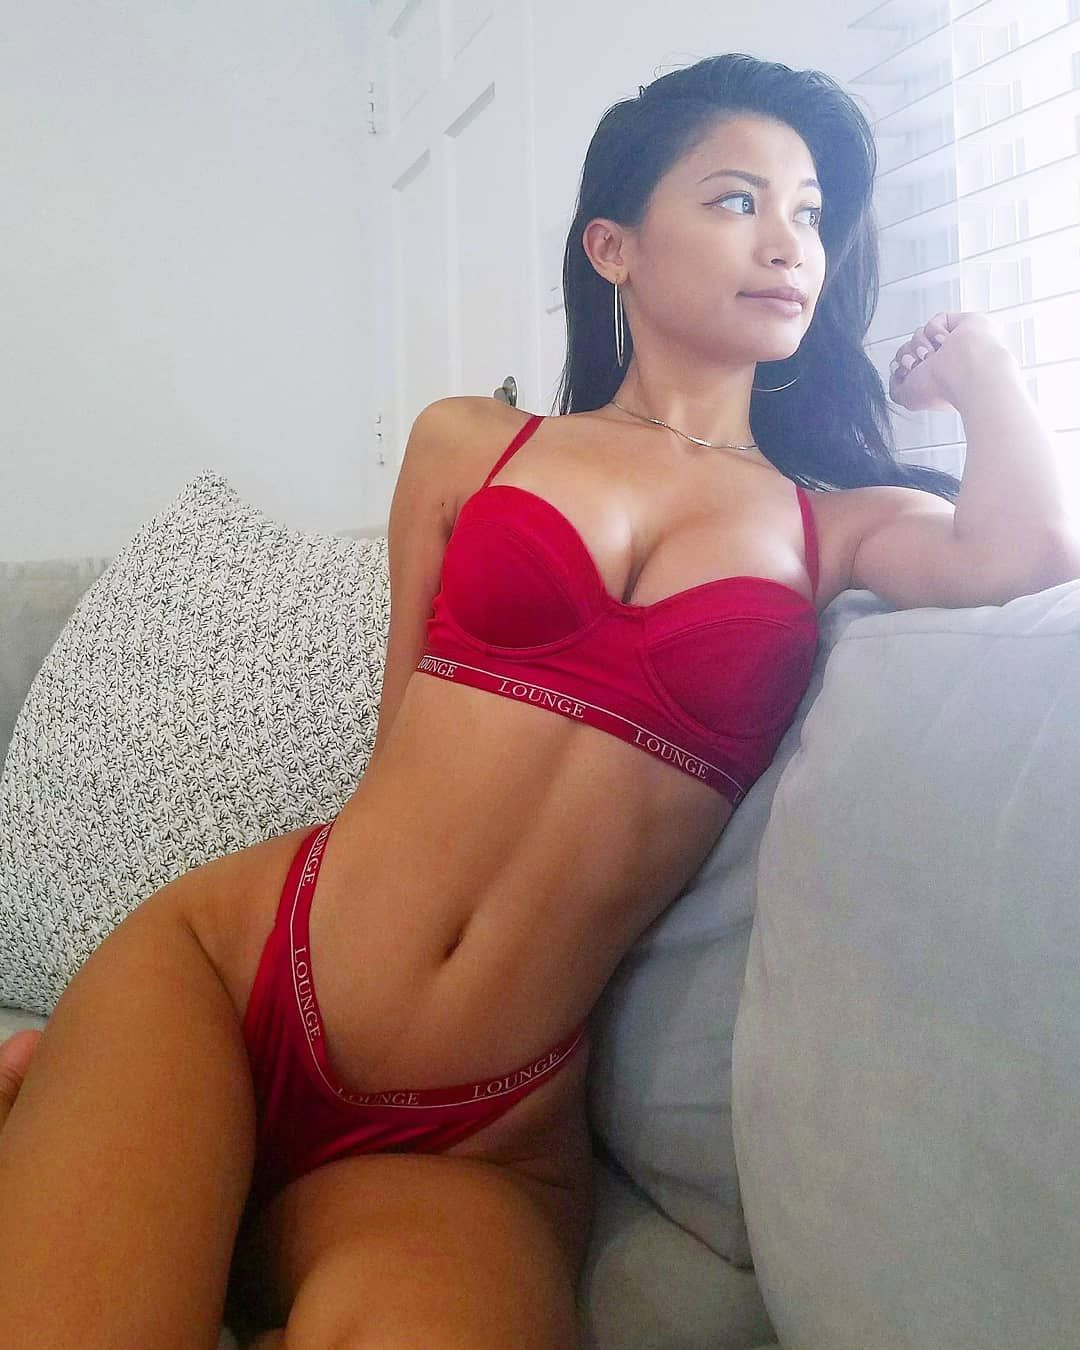 Strange Pat busty thai girl